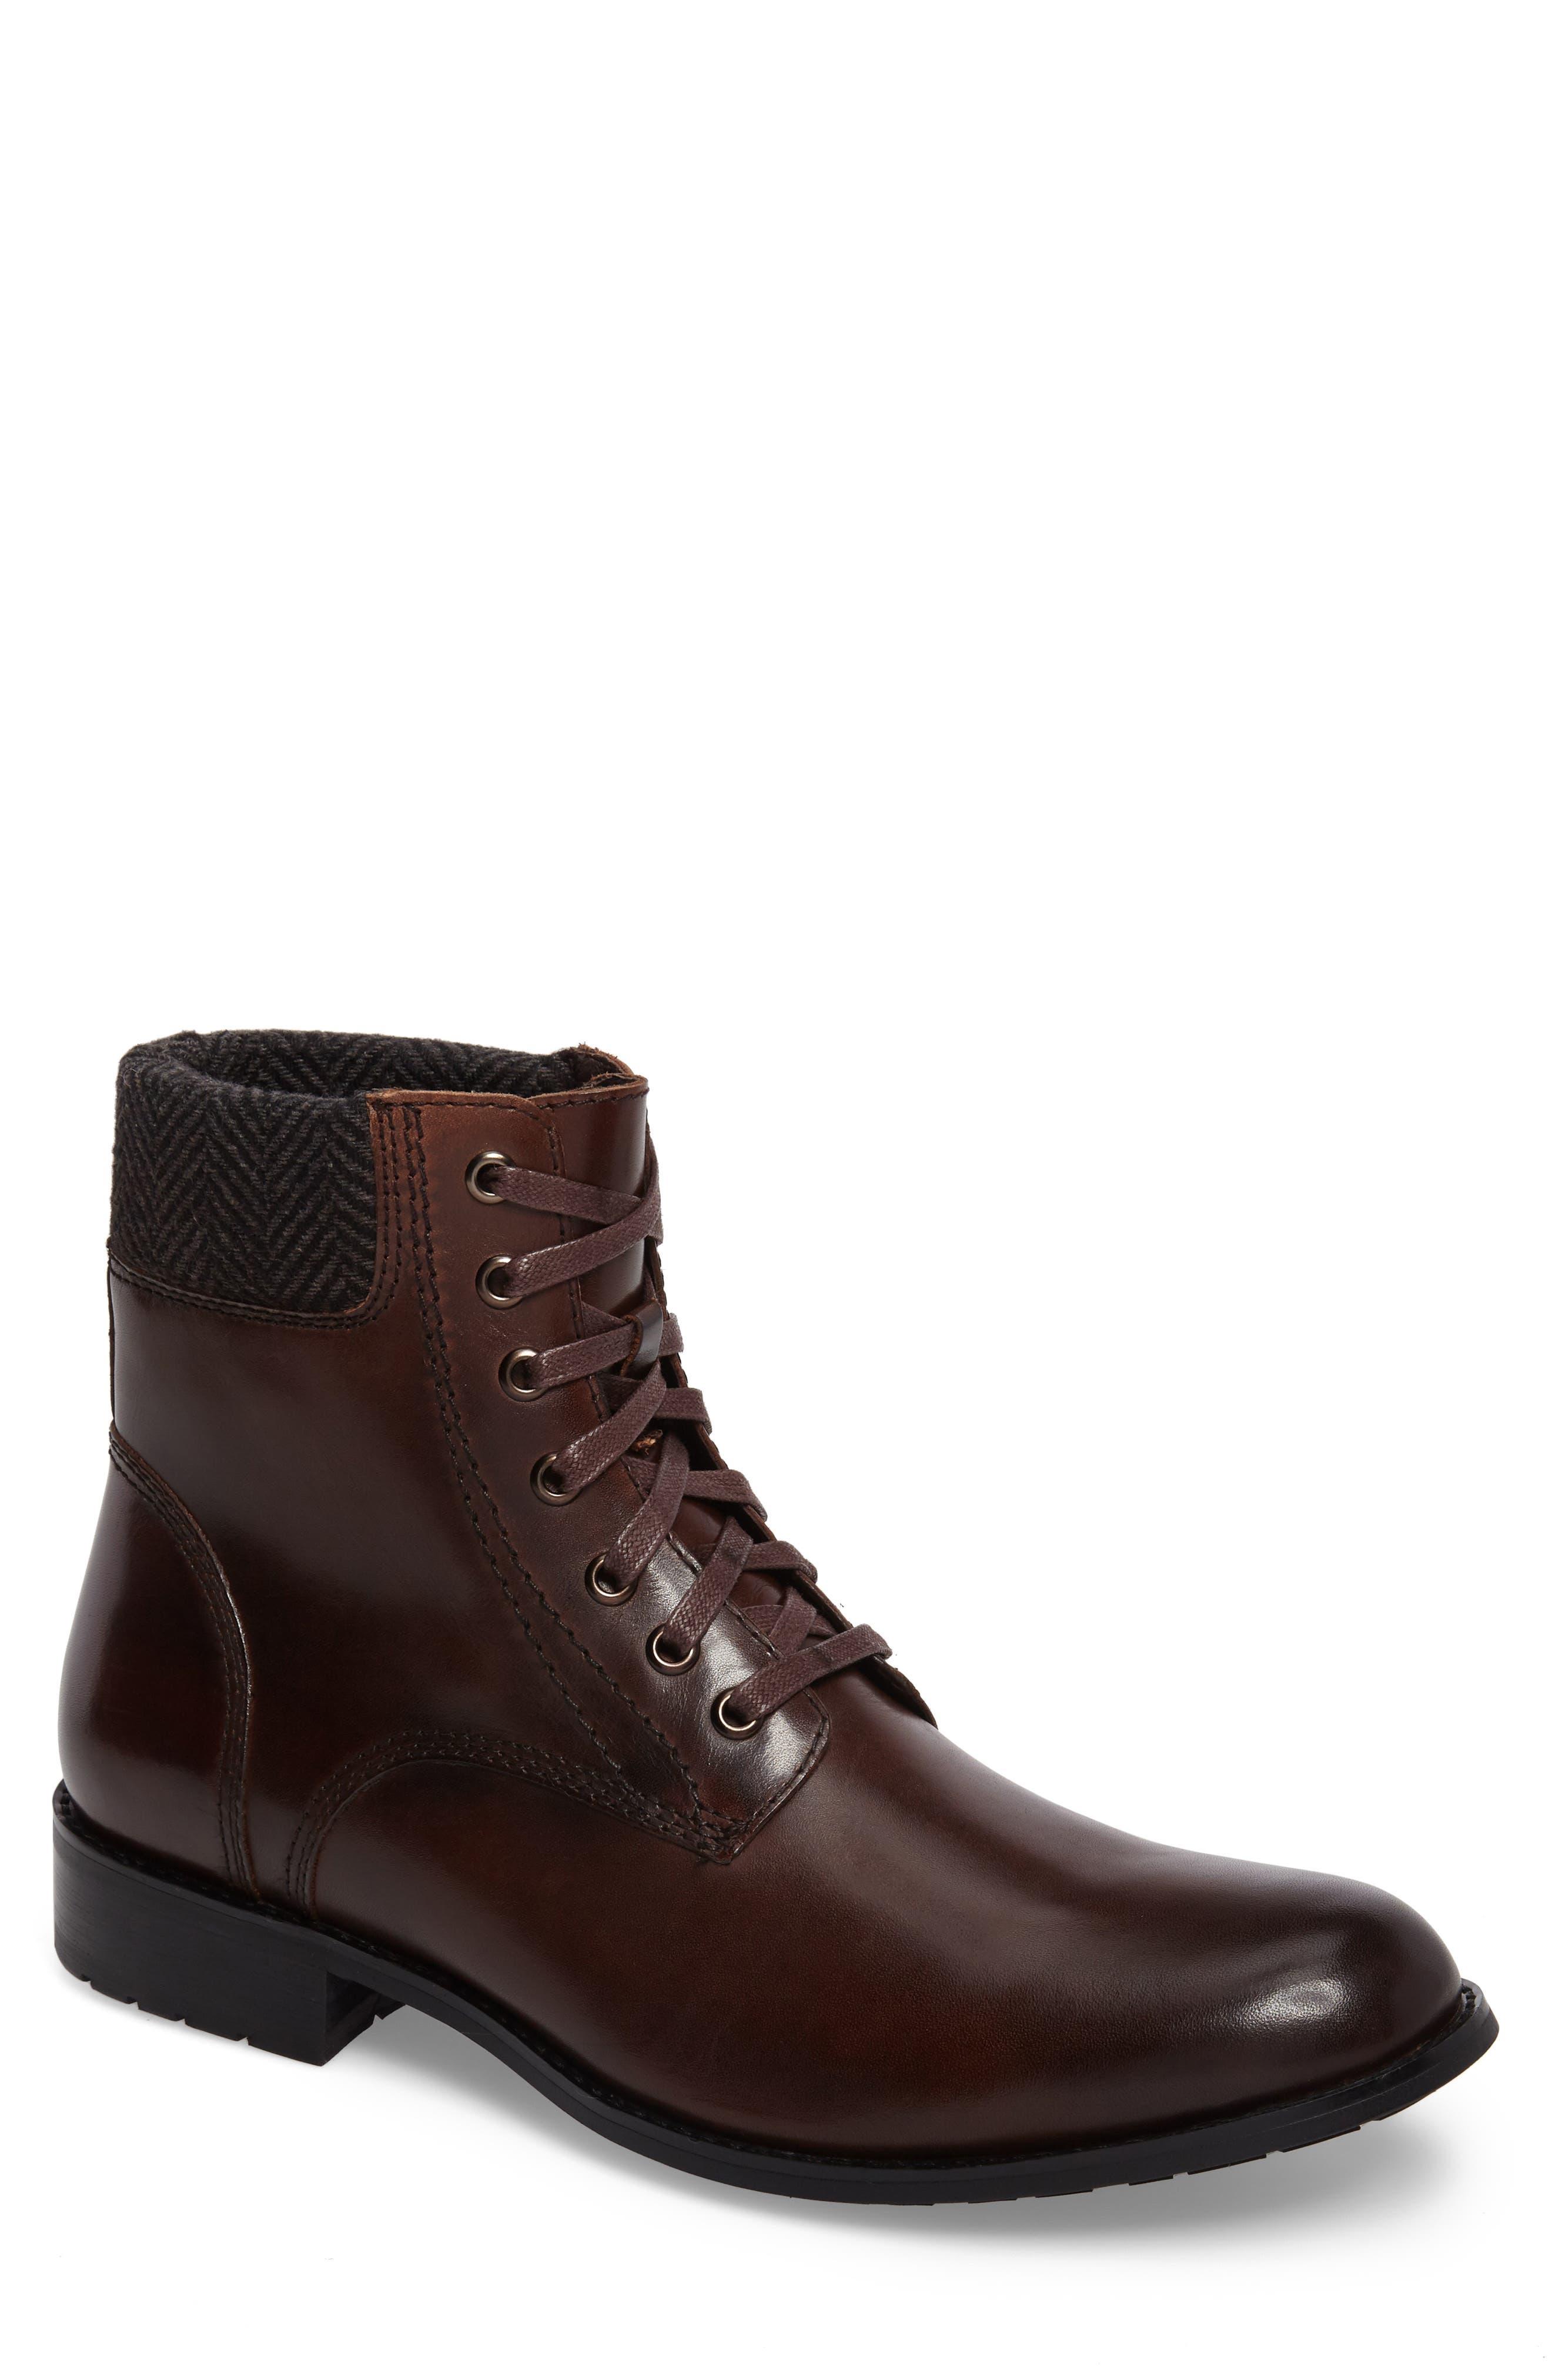 Saar Plain Toe Boot,                         Main,                         color, Brown Leather